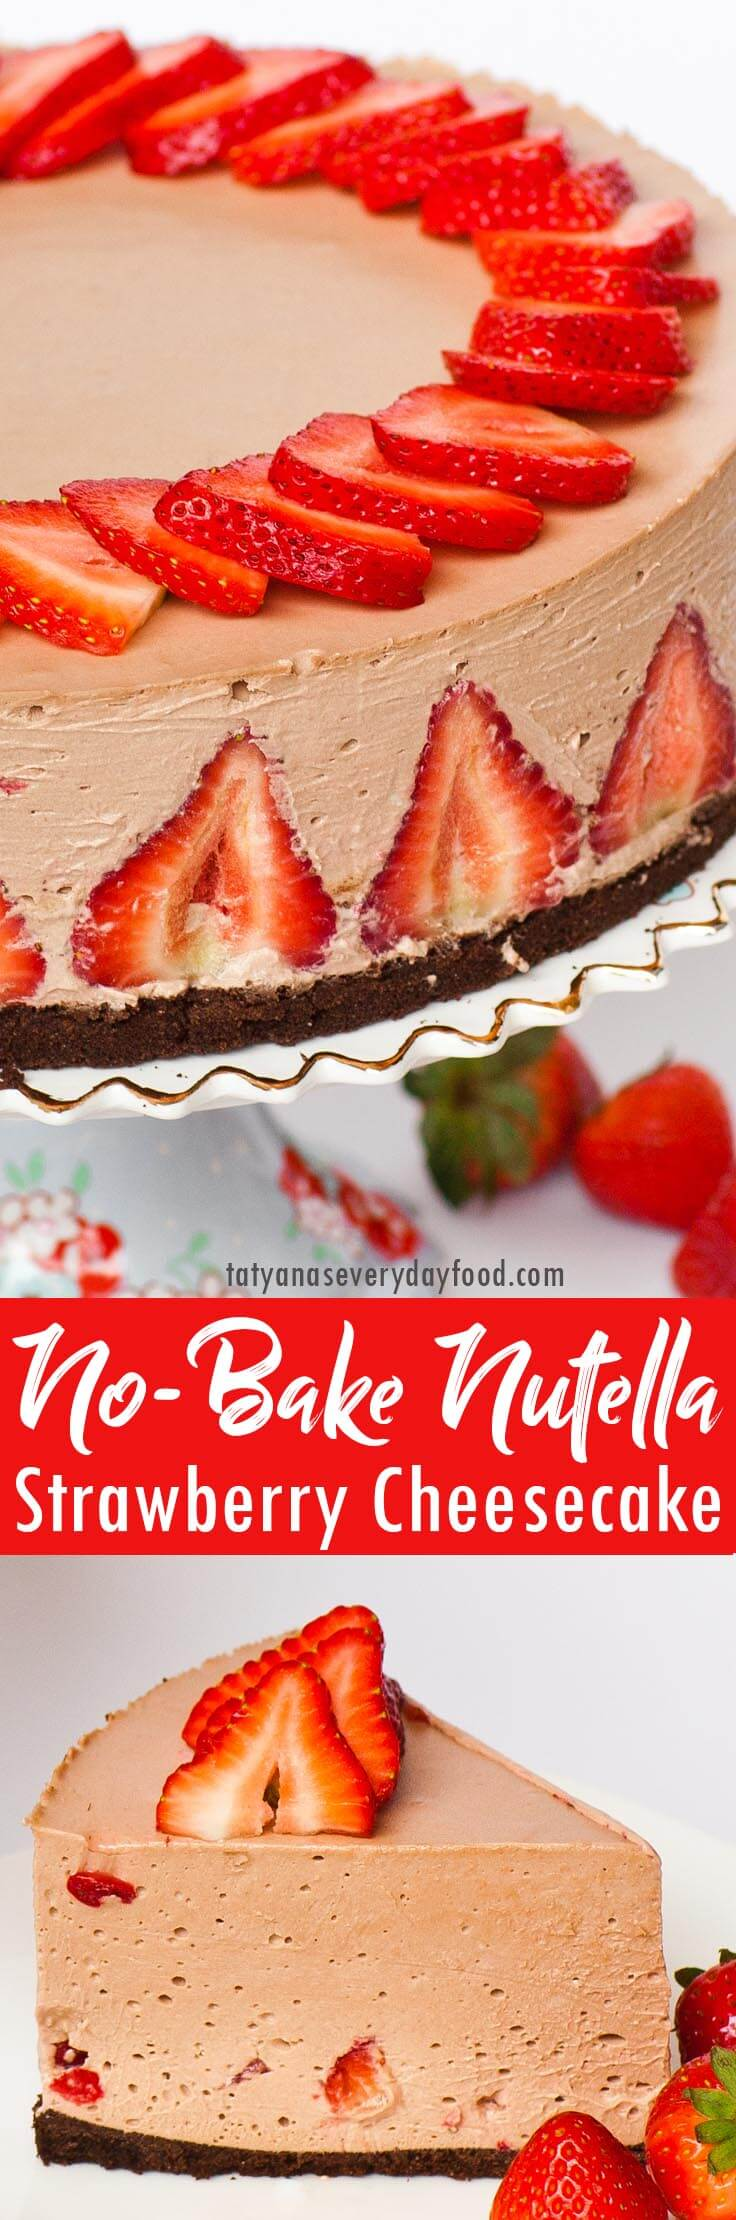 No-Bake Strawberry Nutella Cheesecake video recipe